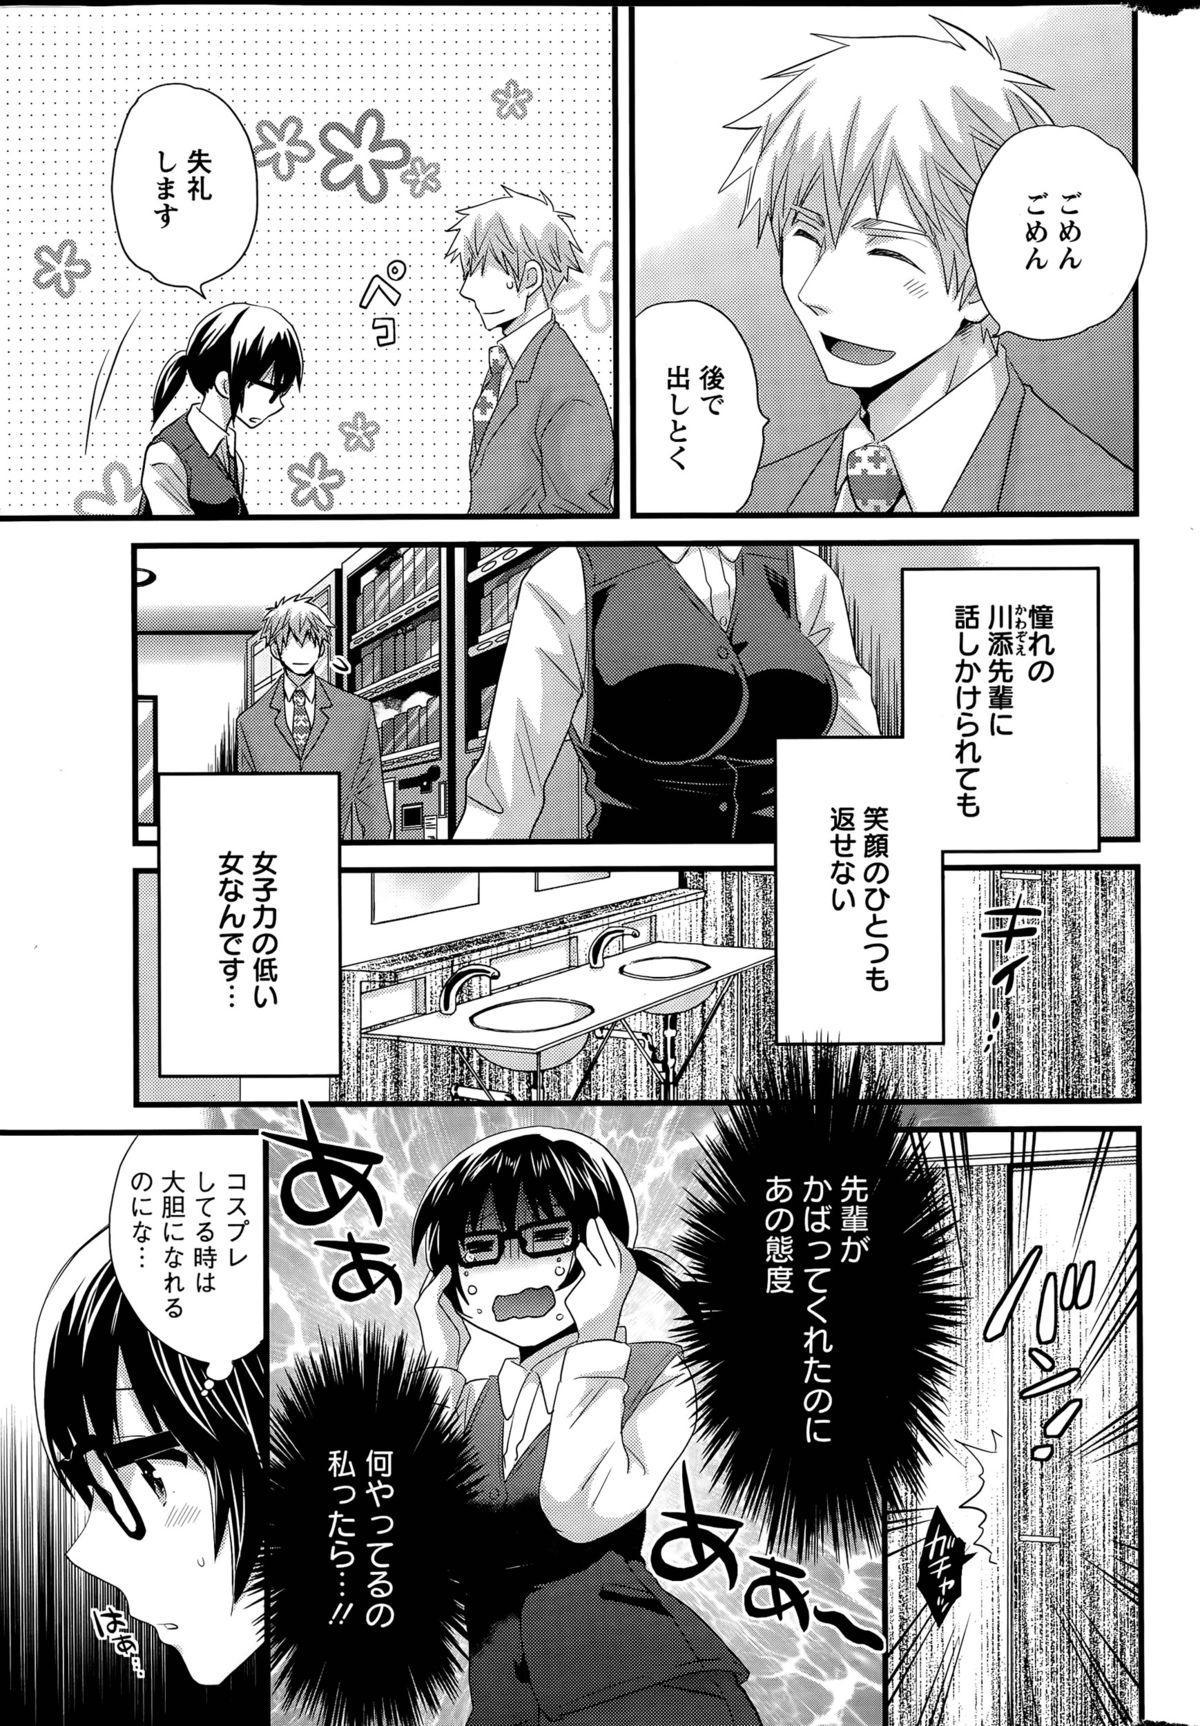 [Pon Takahanada] Otani-san no Cosplay Jijou Ch. 1-5 6